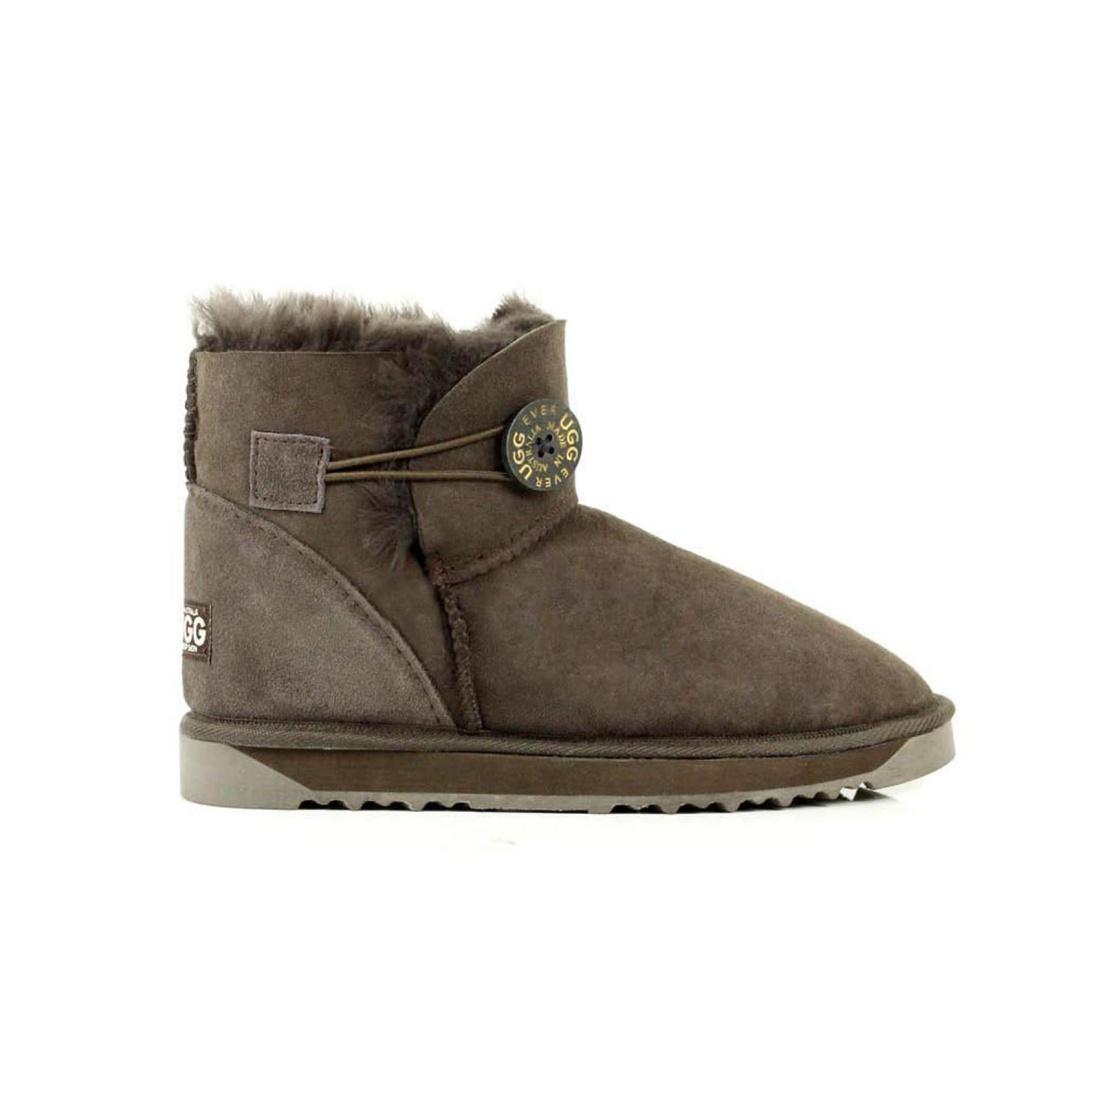 UGG Button Ankle Boots Mini - Chocolate - AU Women 7 / Men 5